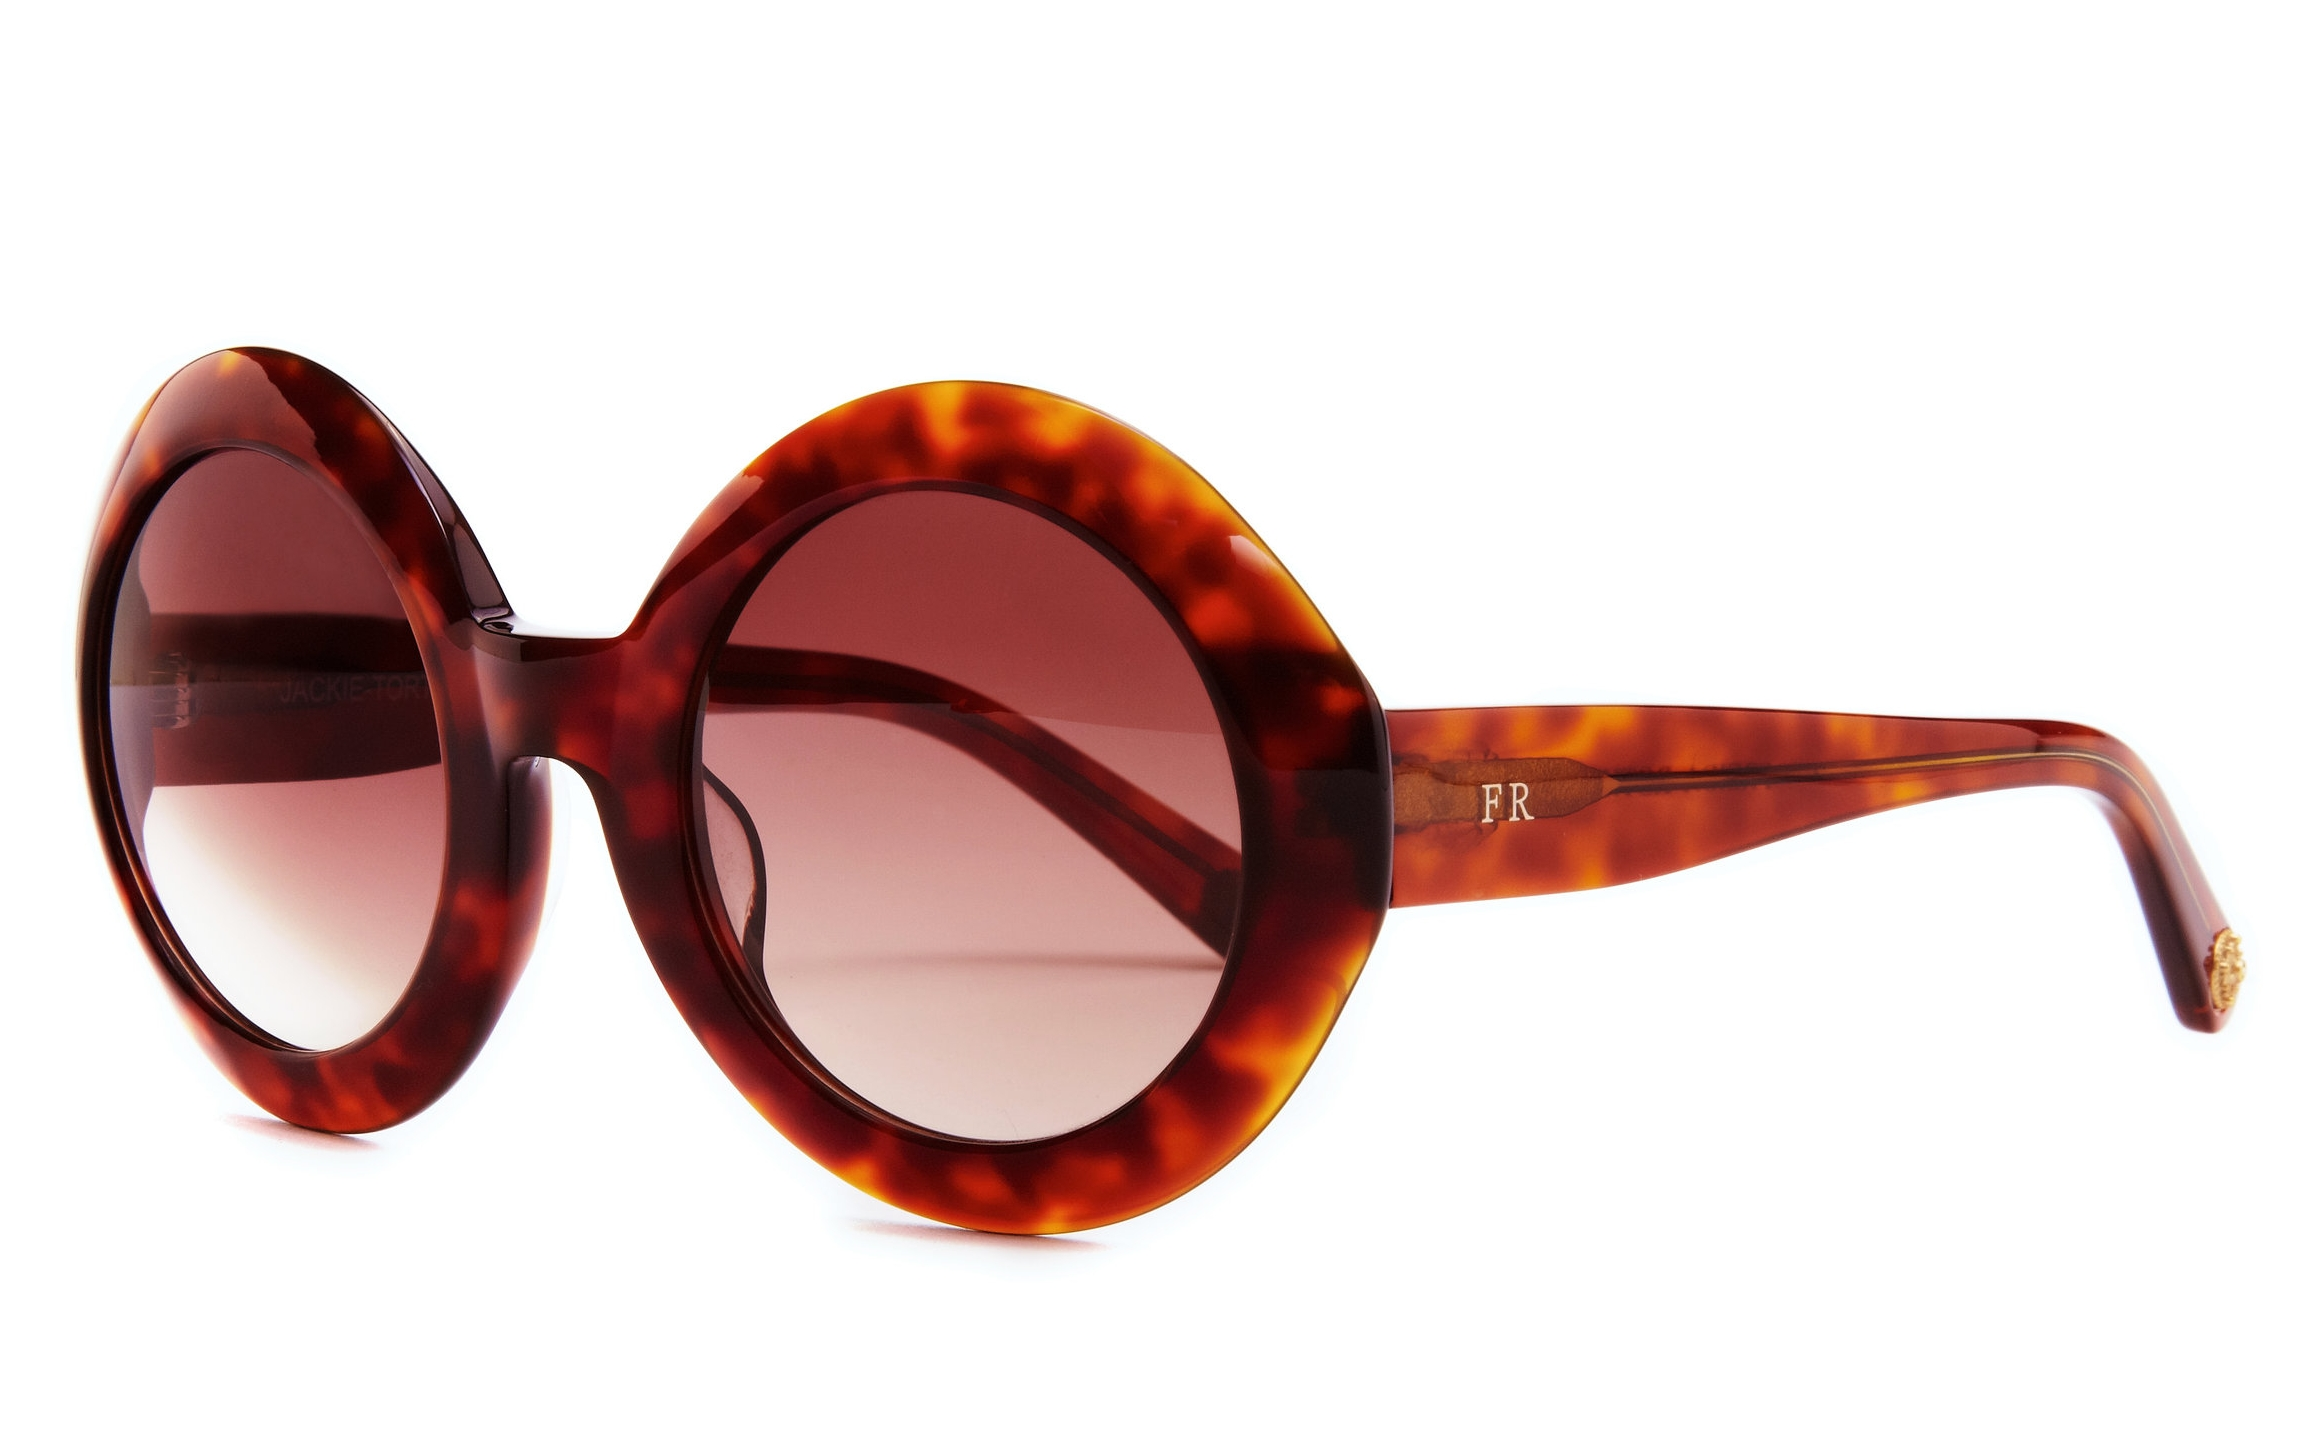 Sunglasses-4_0016.jpg